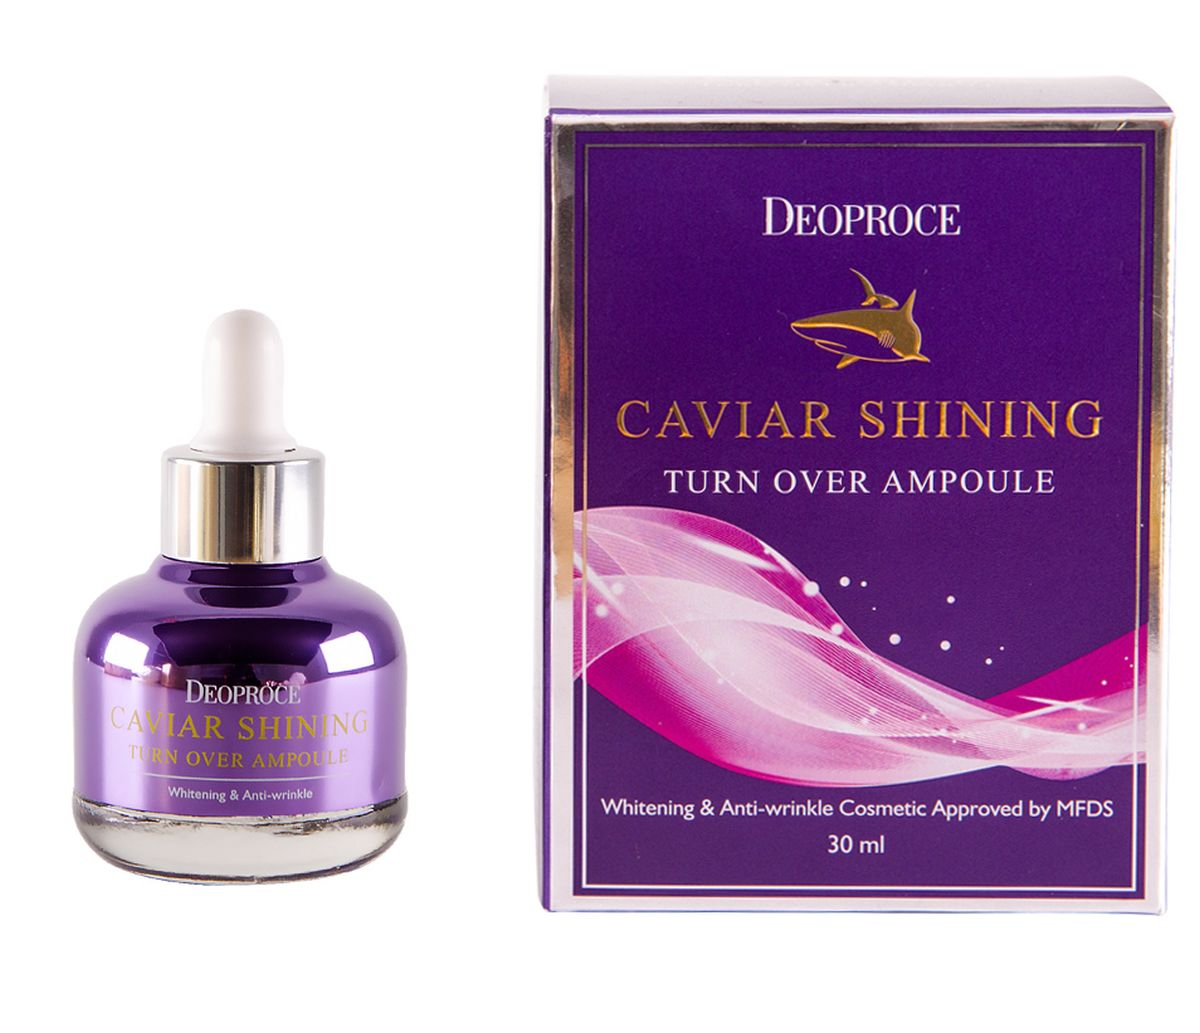 Сыворотка с экстрактом икры DEOPROCE Caviar Shining Turn Over Ampoule - 30 мл